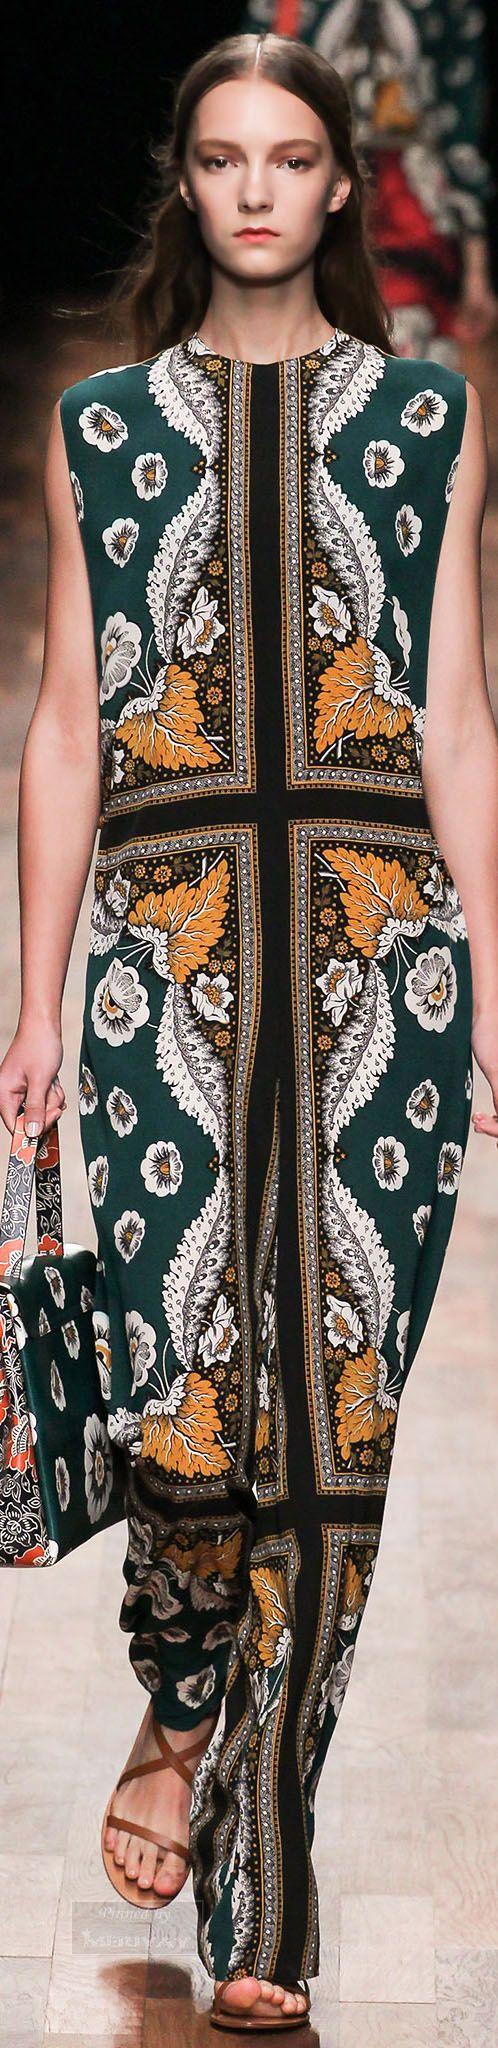 Gypsy Travel Pack Your Bags| Serafini Amelia| Summer Travel Attire| Valentino.Spring 2015.